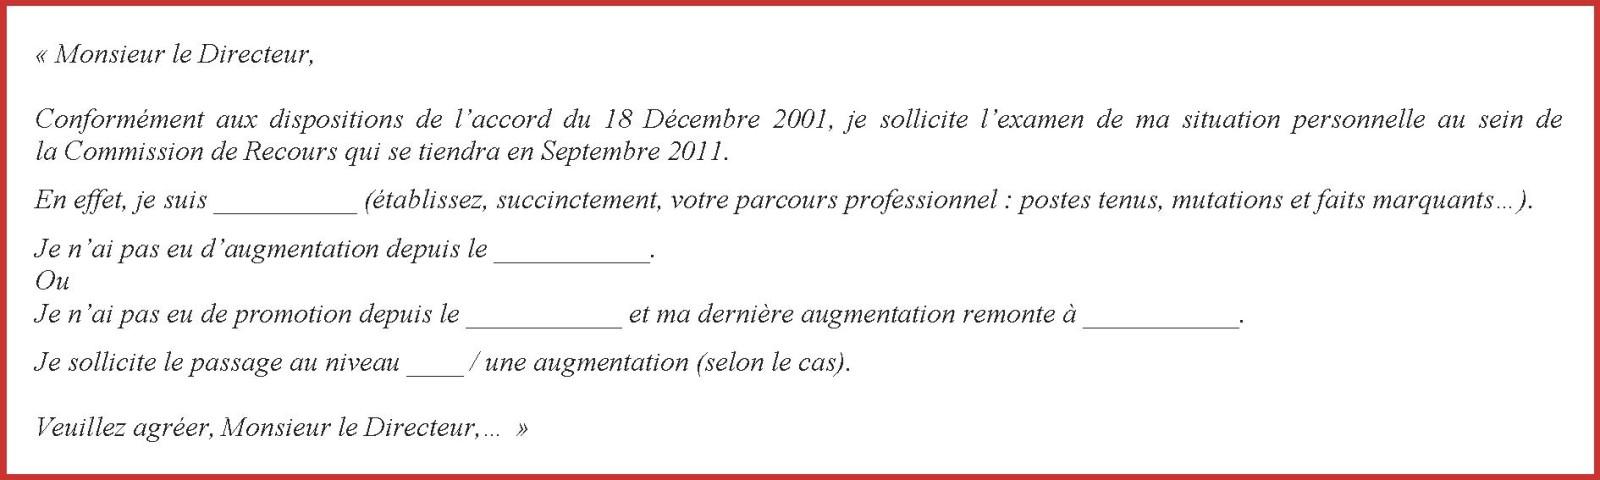 certificat d u0026 39 hebergement a titre gratuit pdf